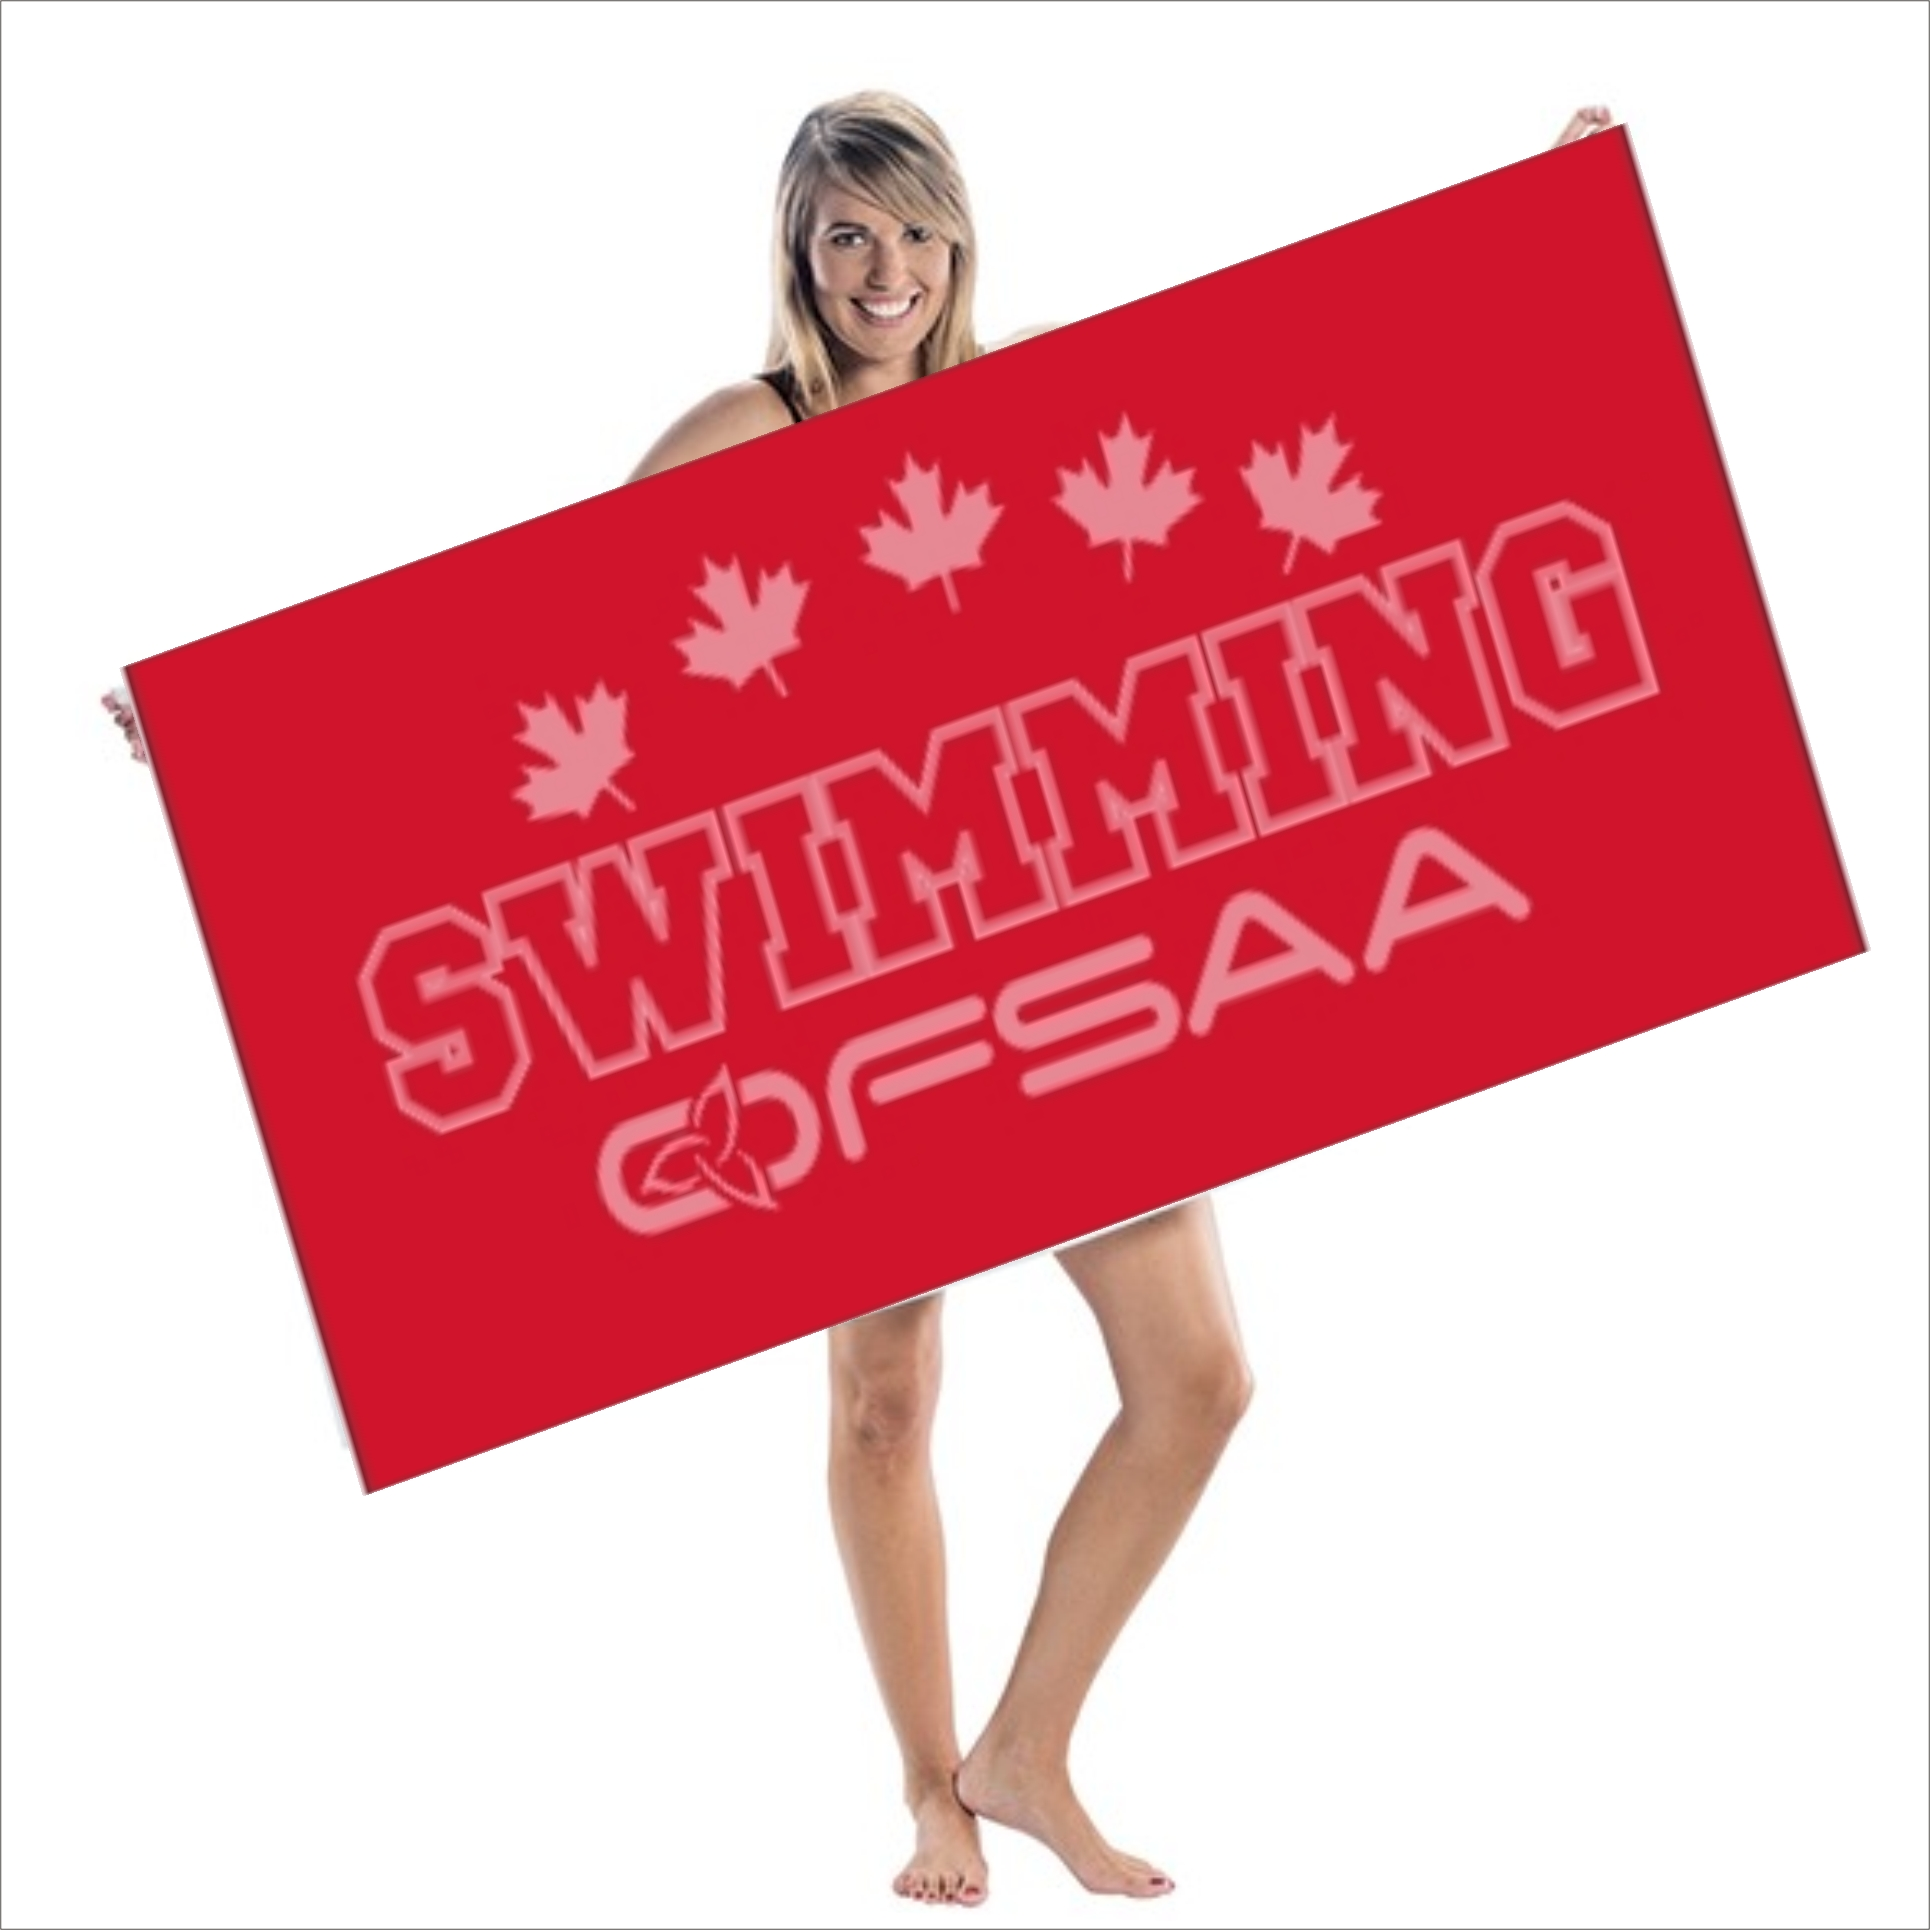 Swim girl with red towel.jpg